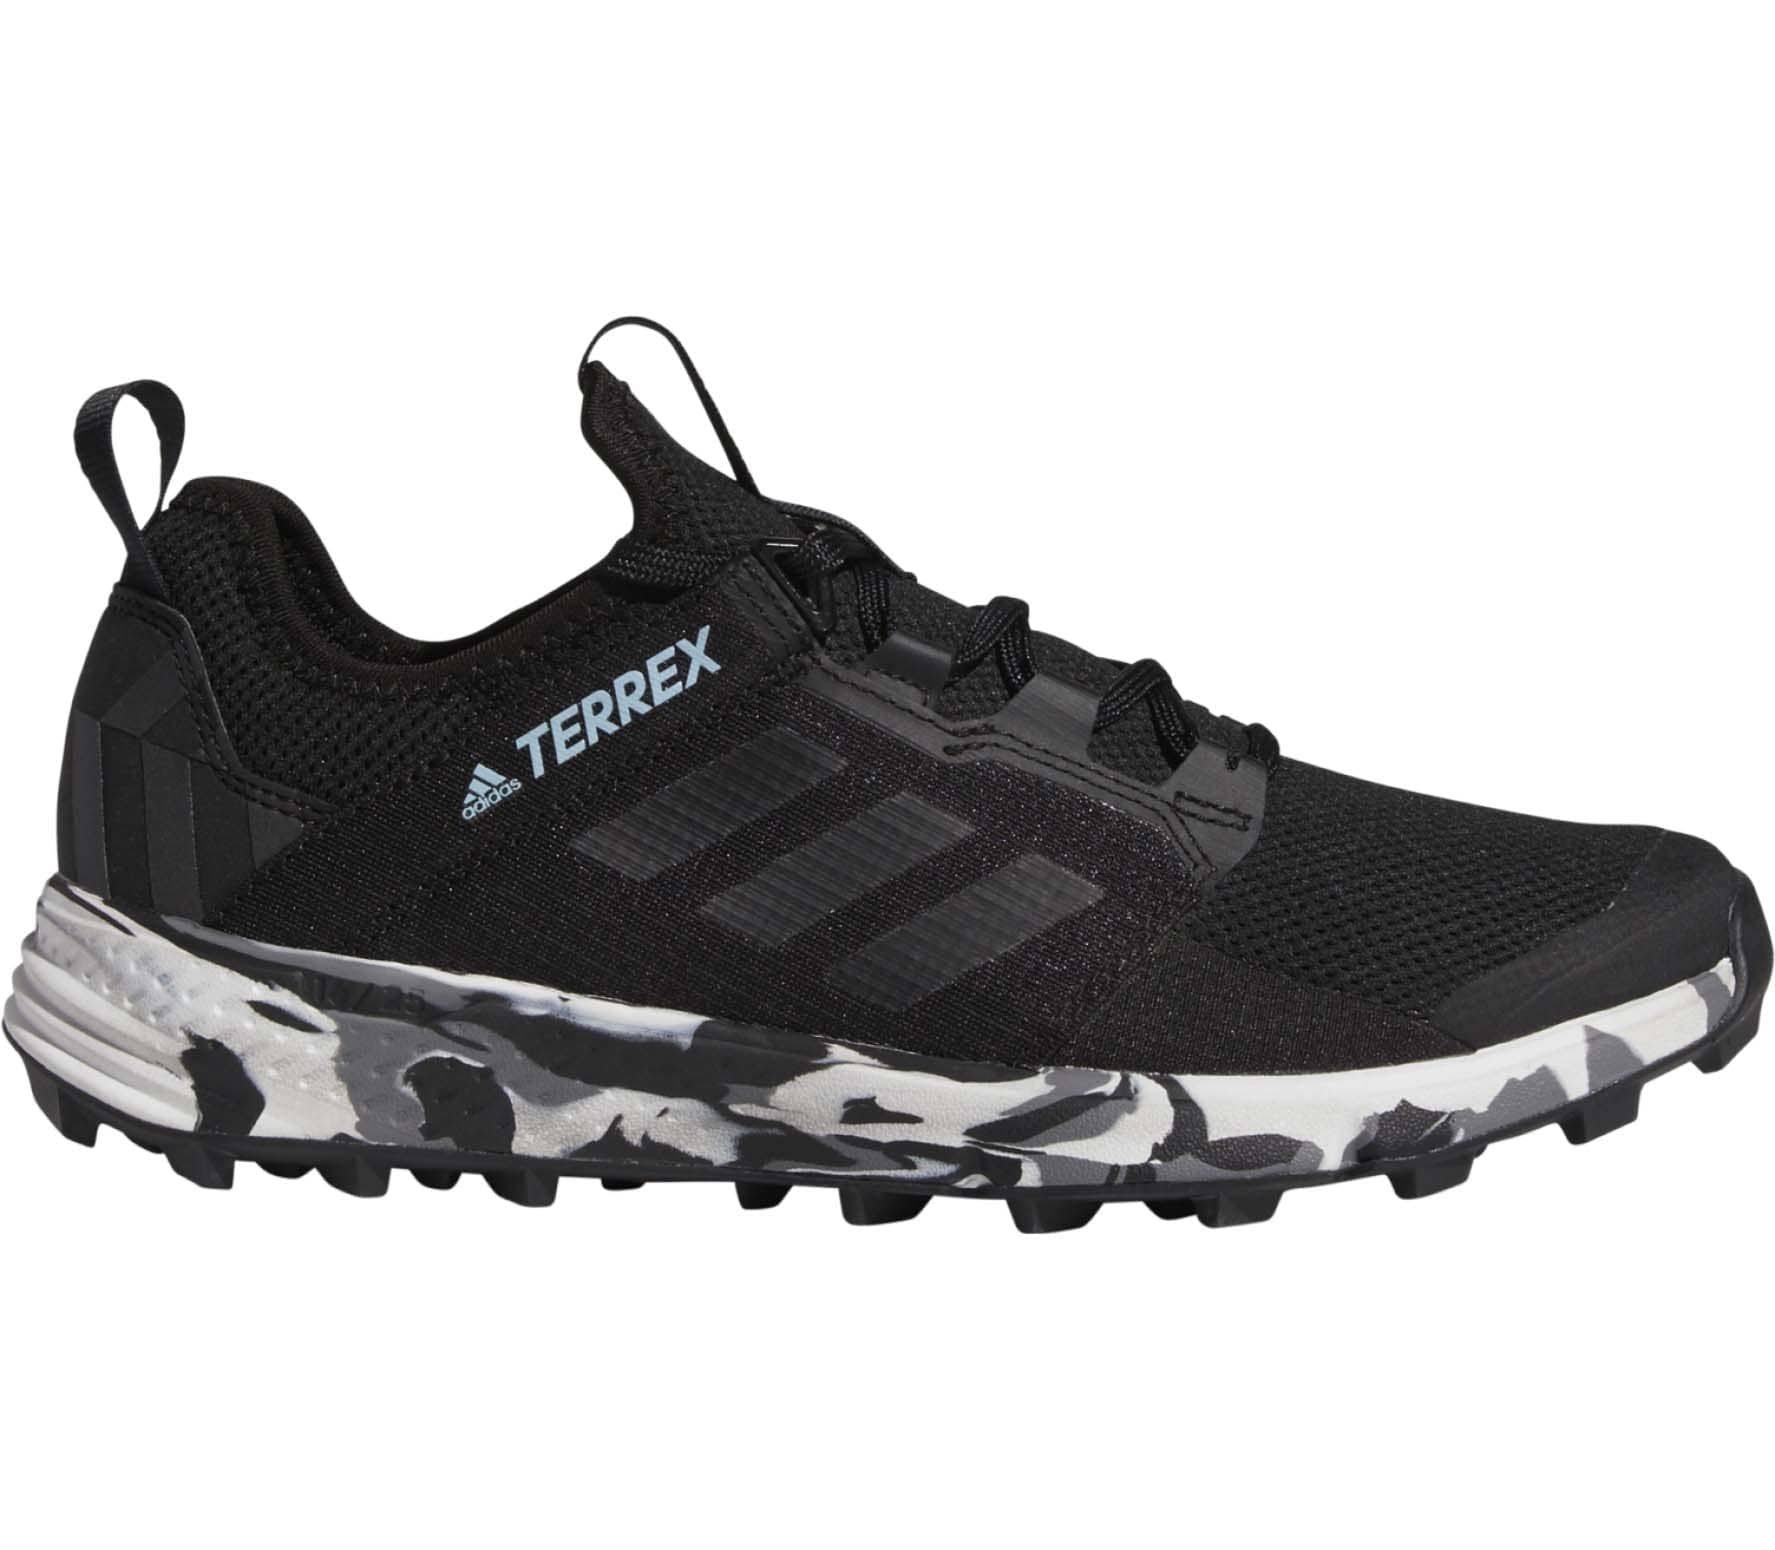 Adidas Terrex Speed LD Women Trailrunning Shoes Black